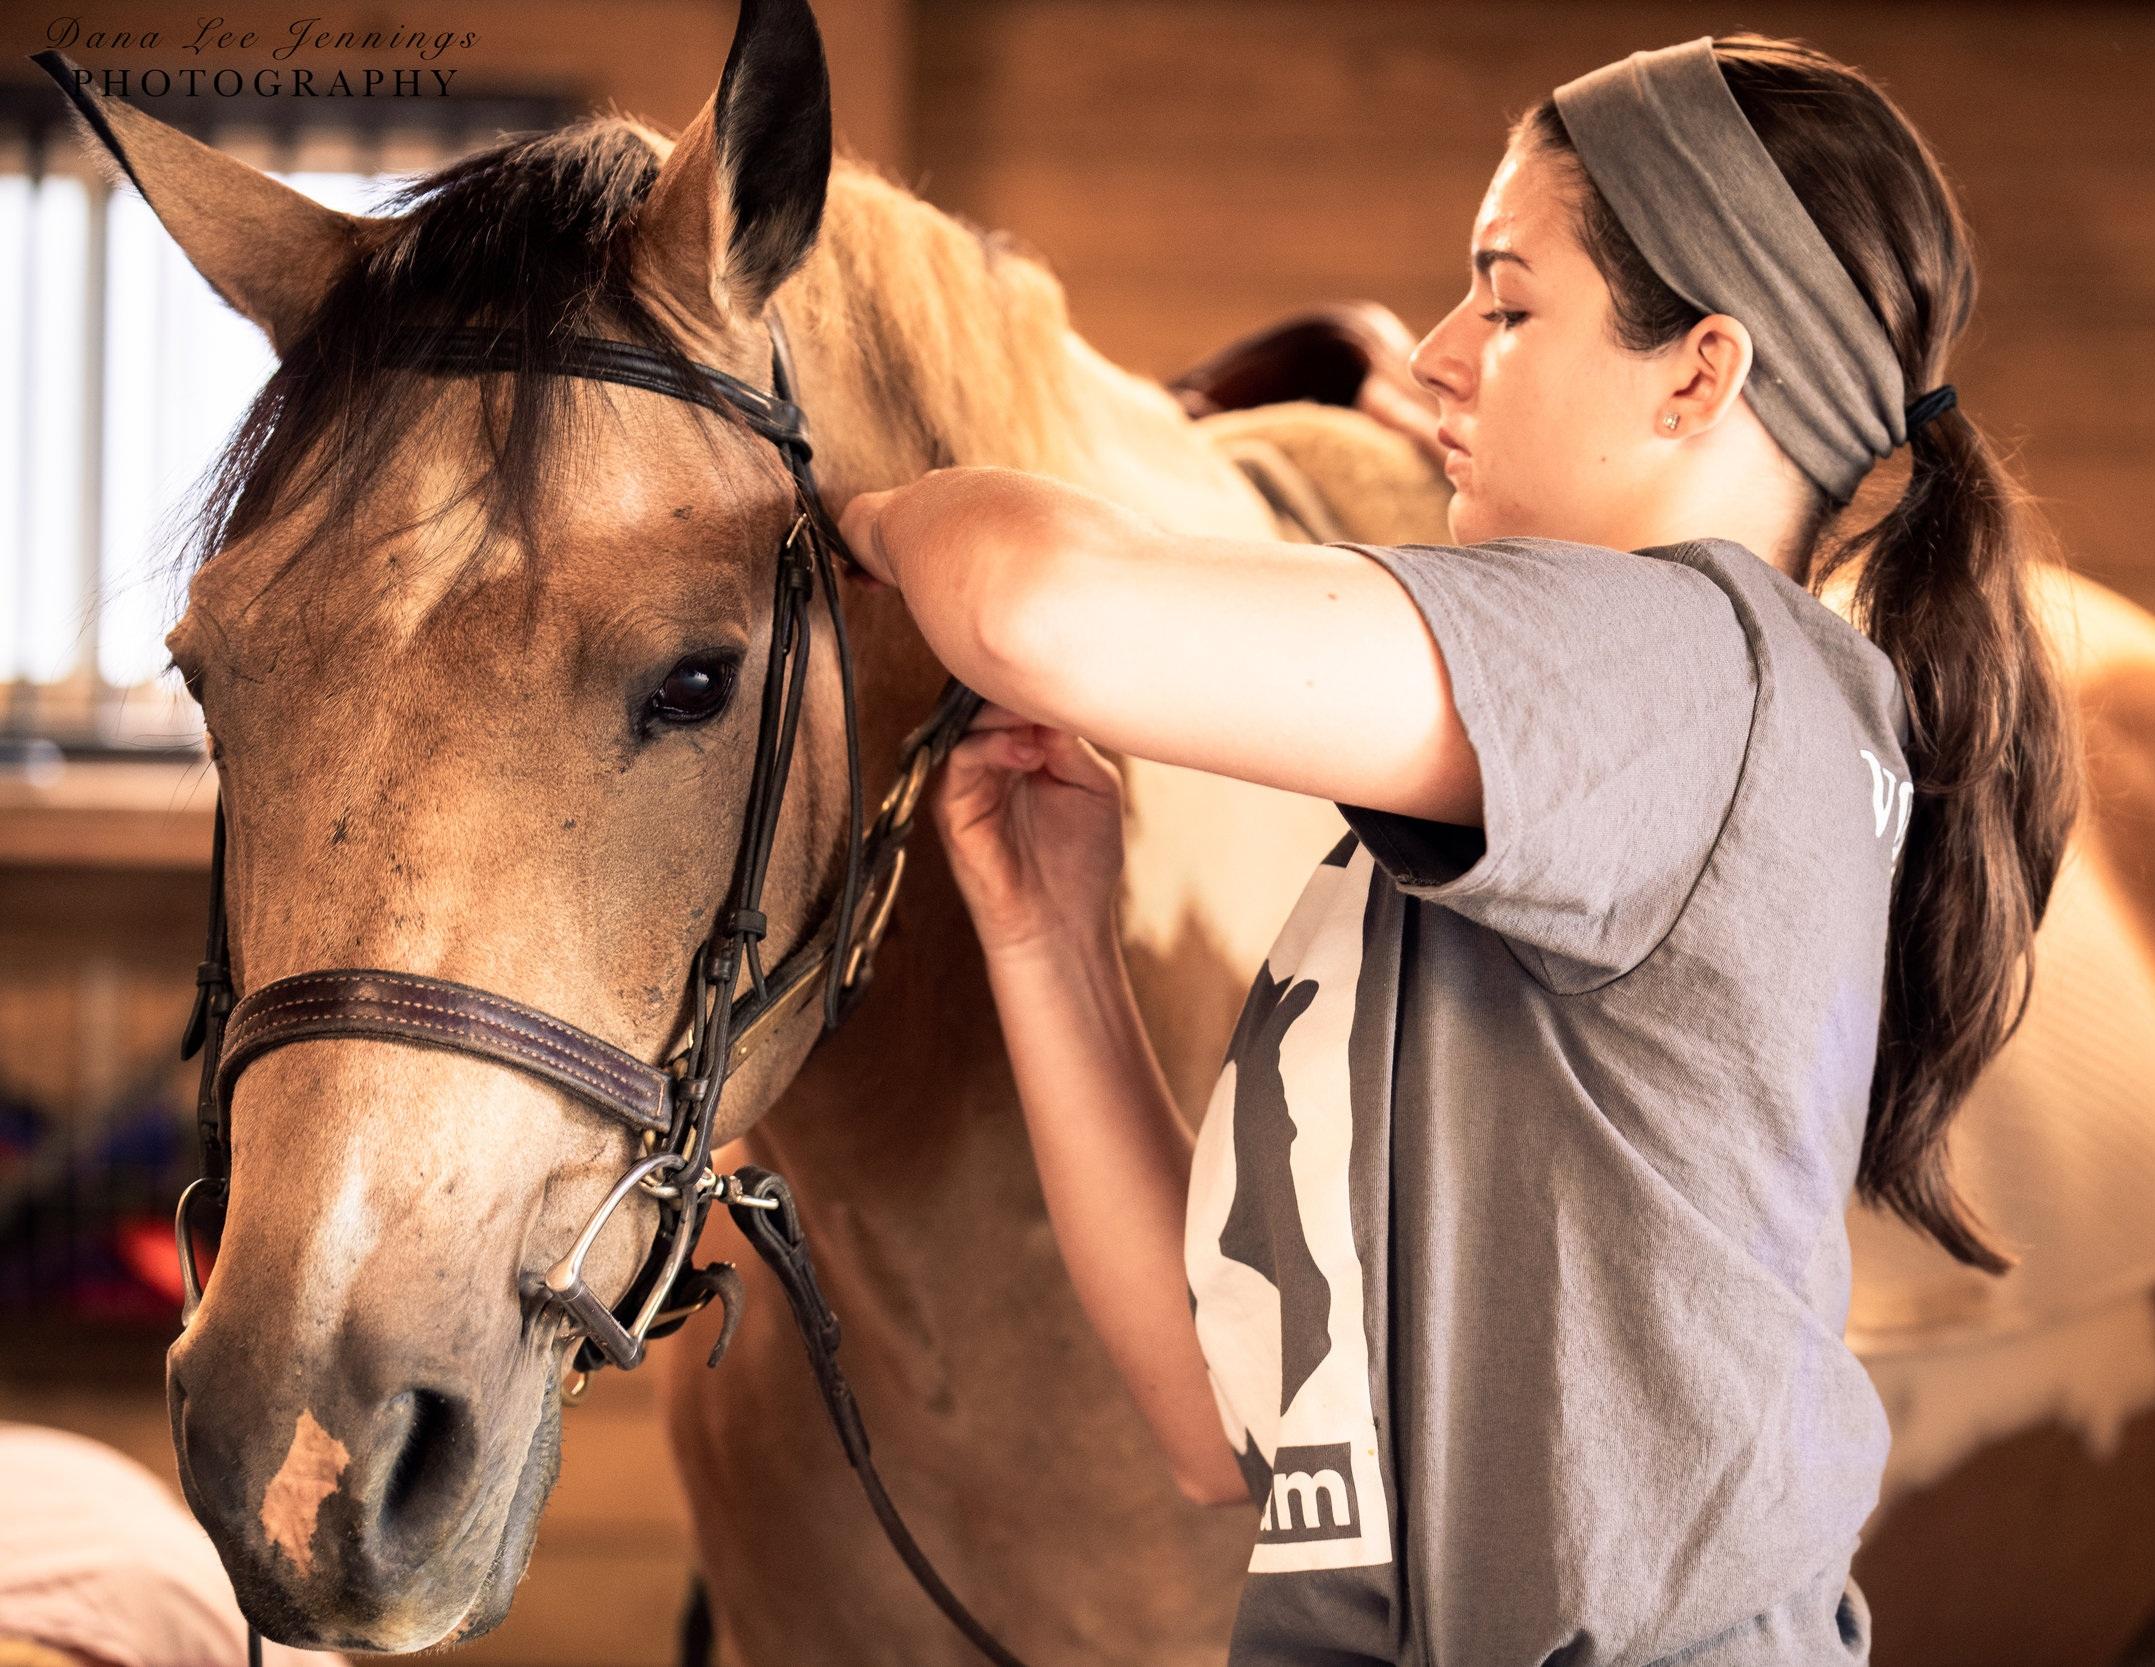 head+shots+and+horses-7275.jpg